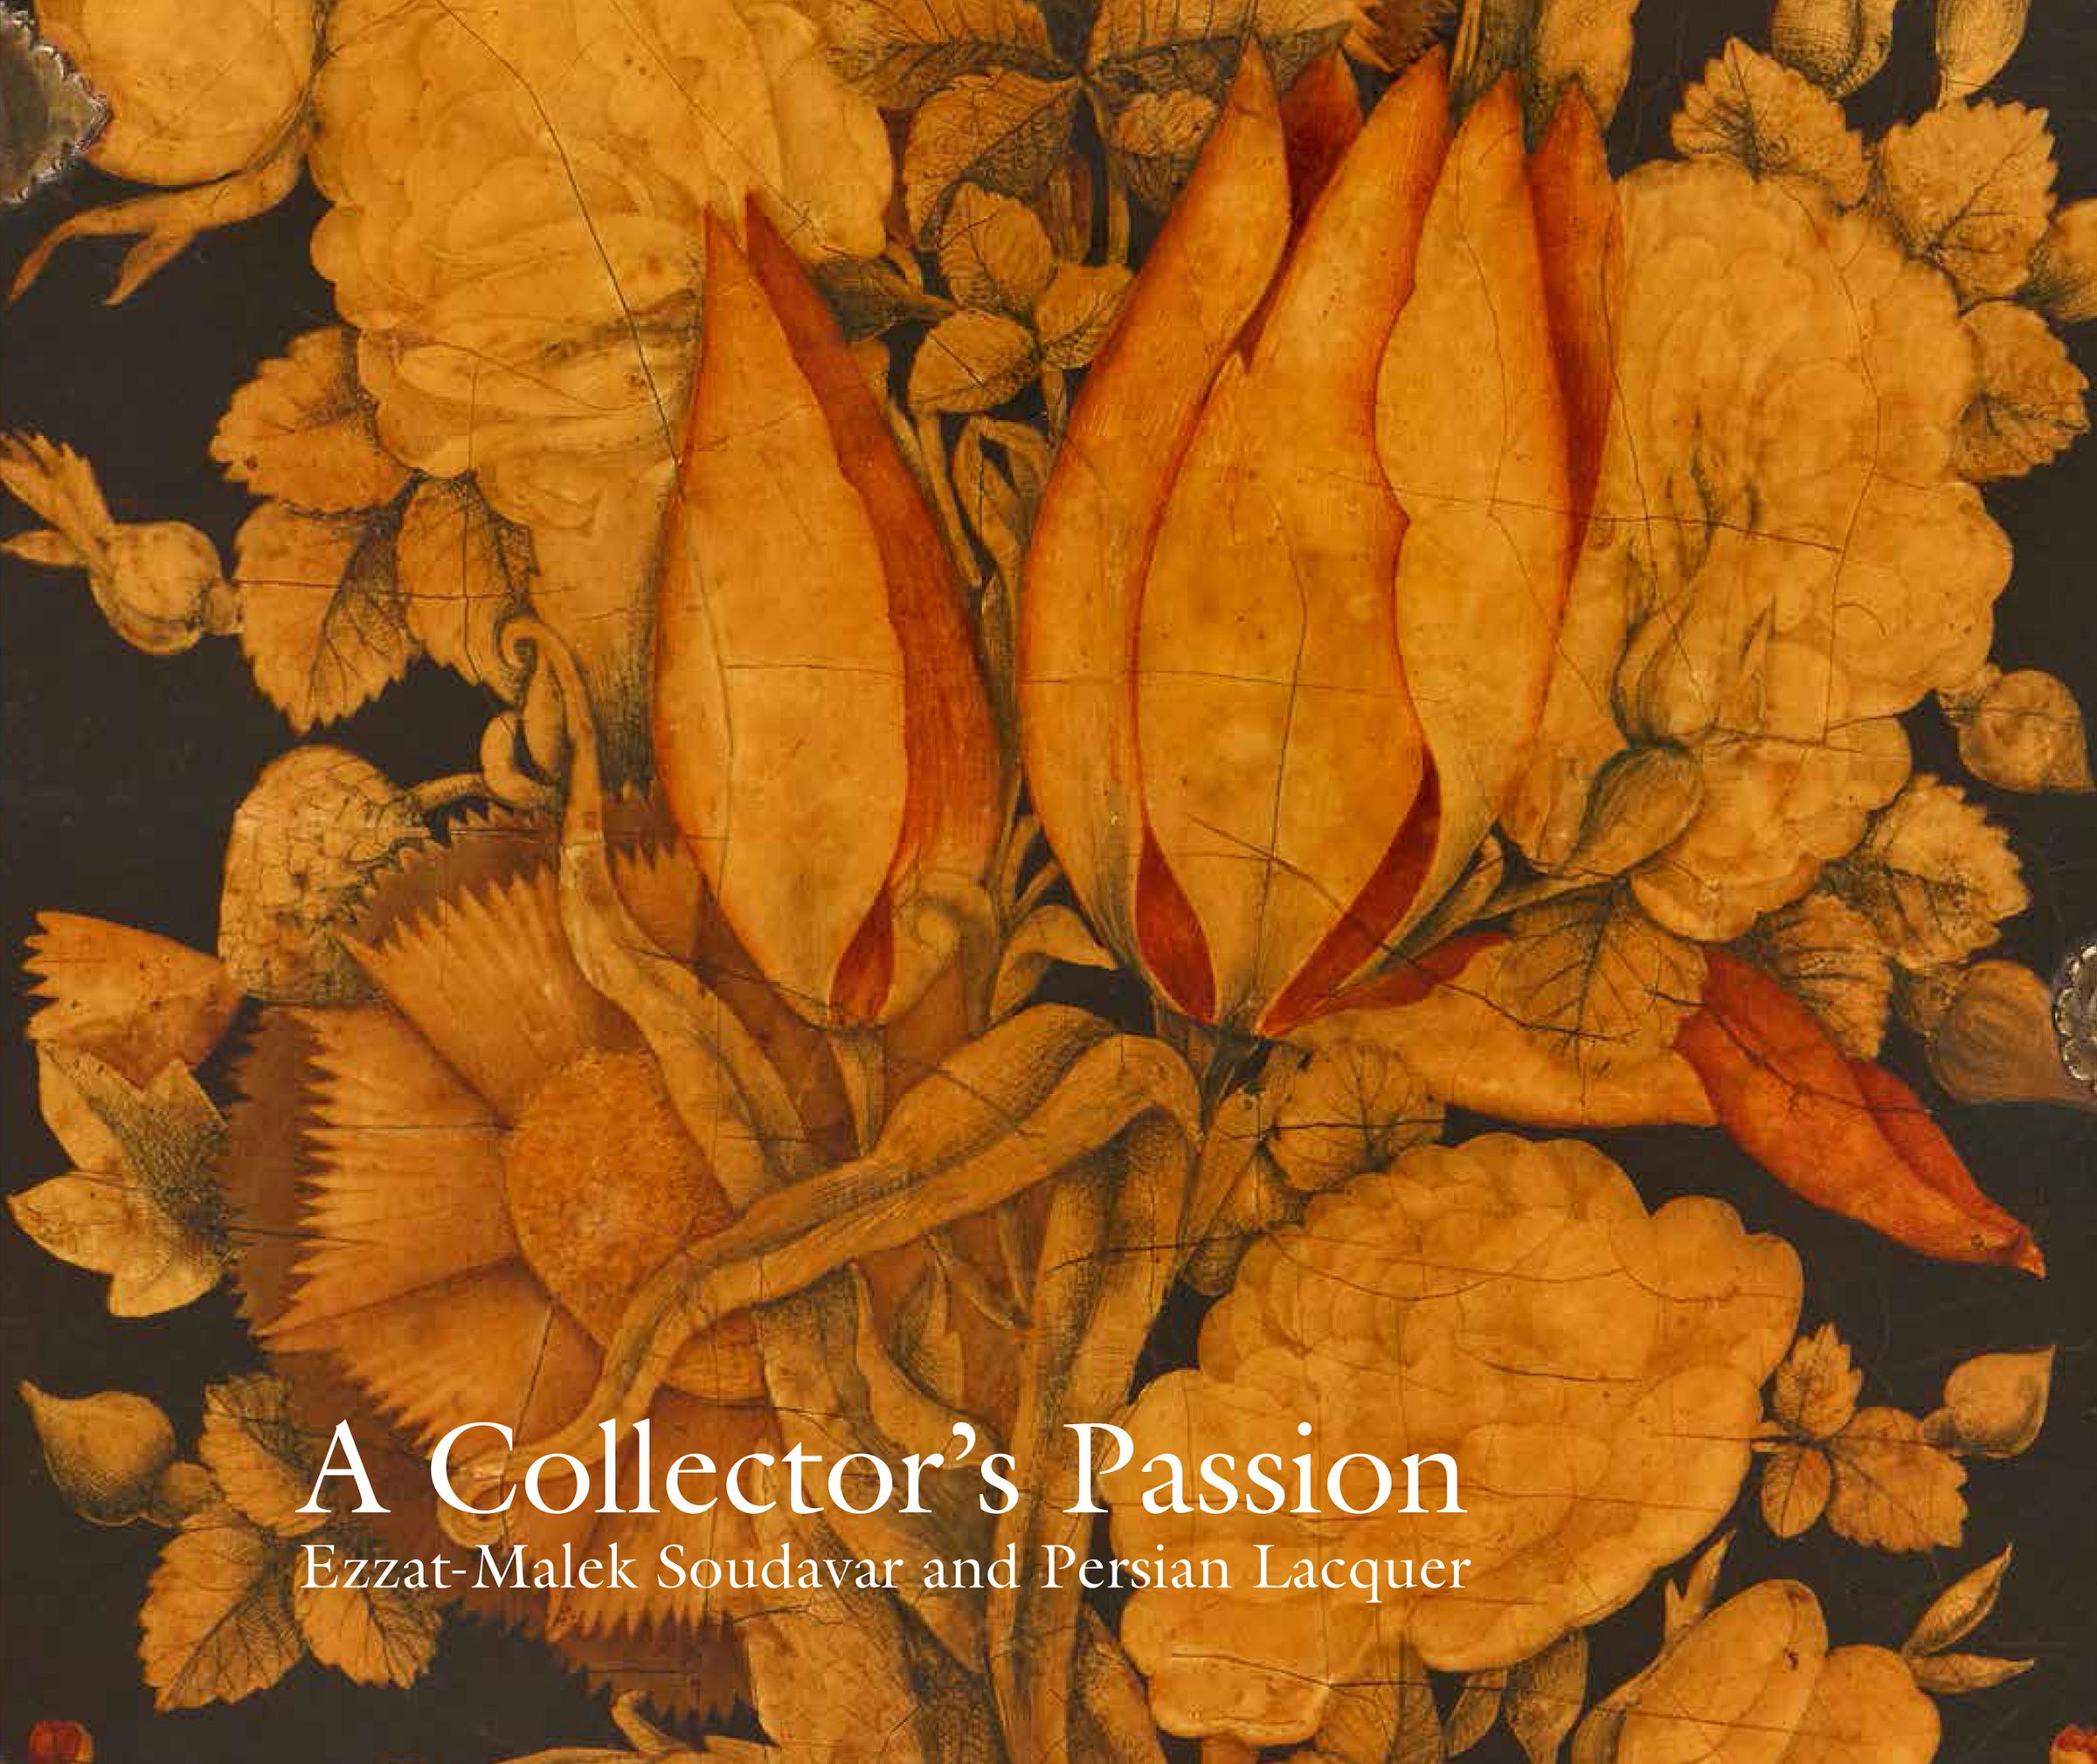 A Collector's Passion: Ezzat-Malek Soudavar and Persian Lacquer